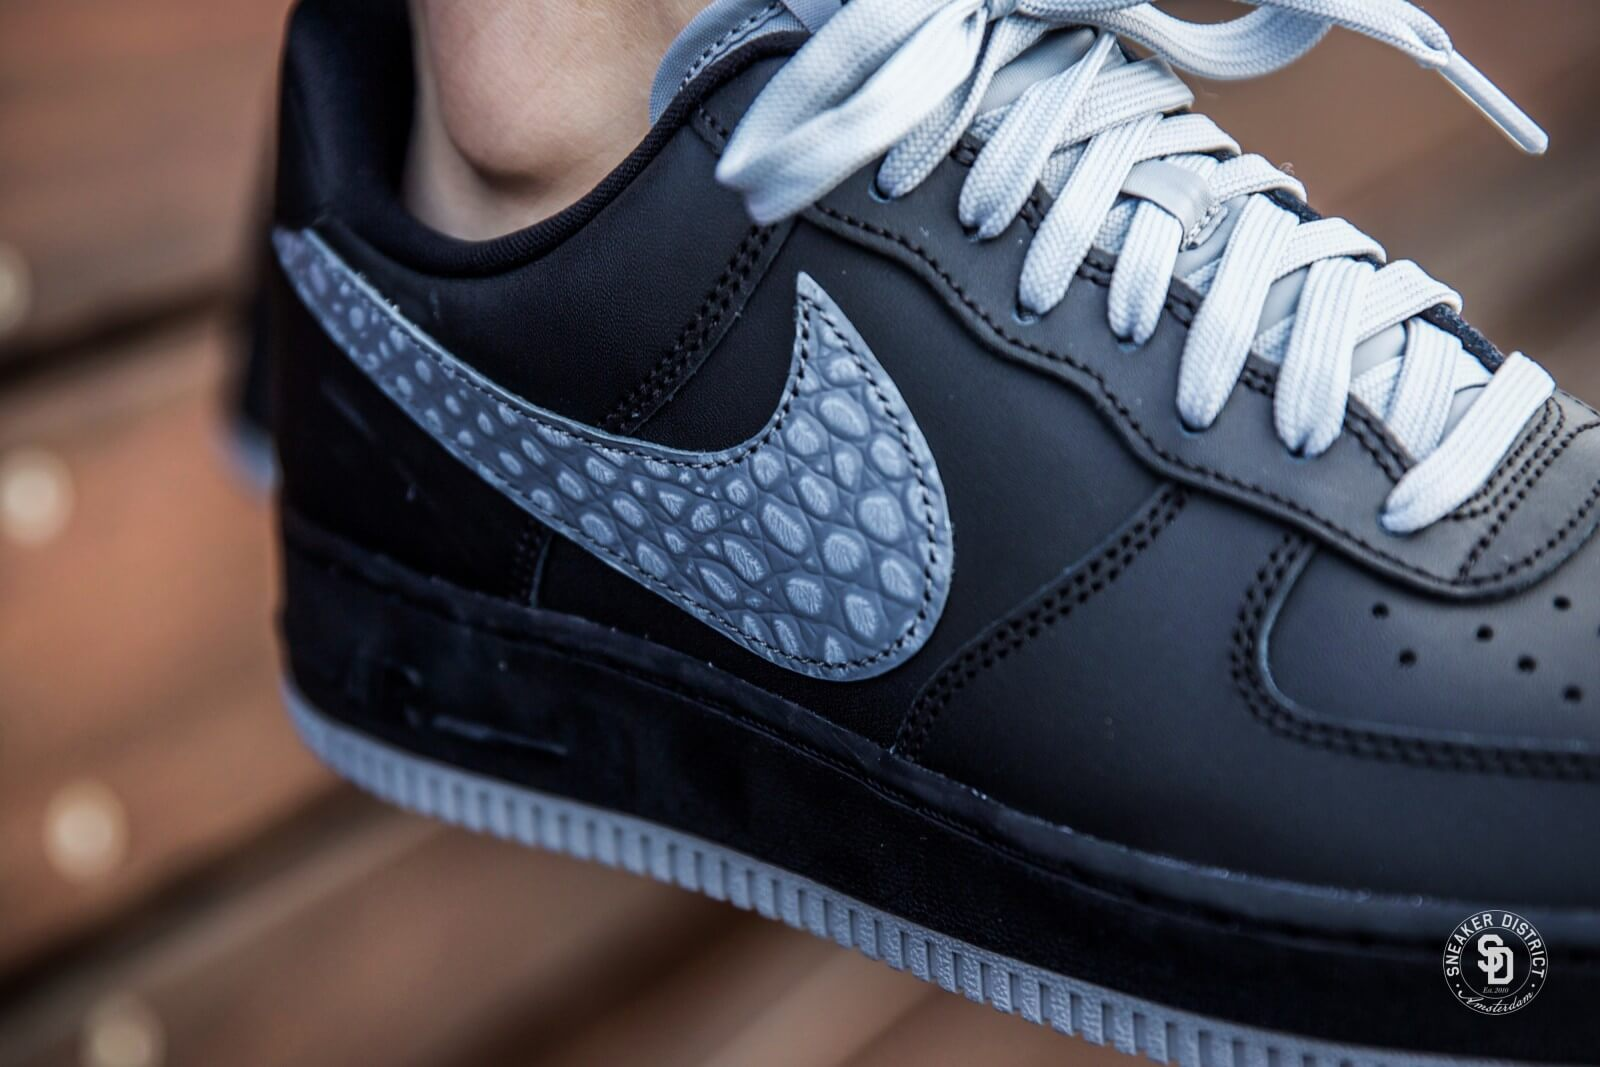 Nike Air Force 1 07 Lv8 Black Cool Grey Heren Sneakers